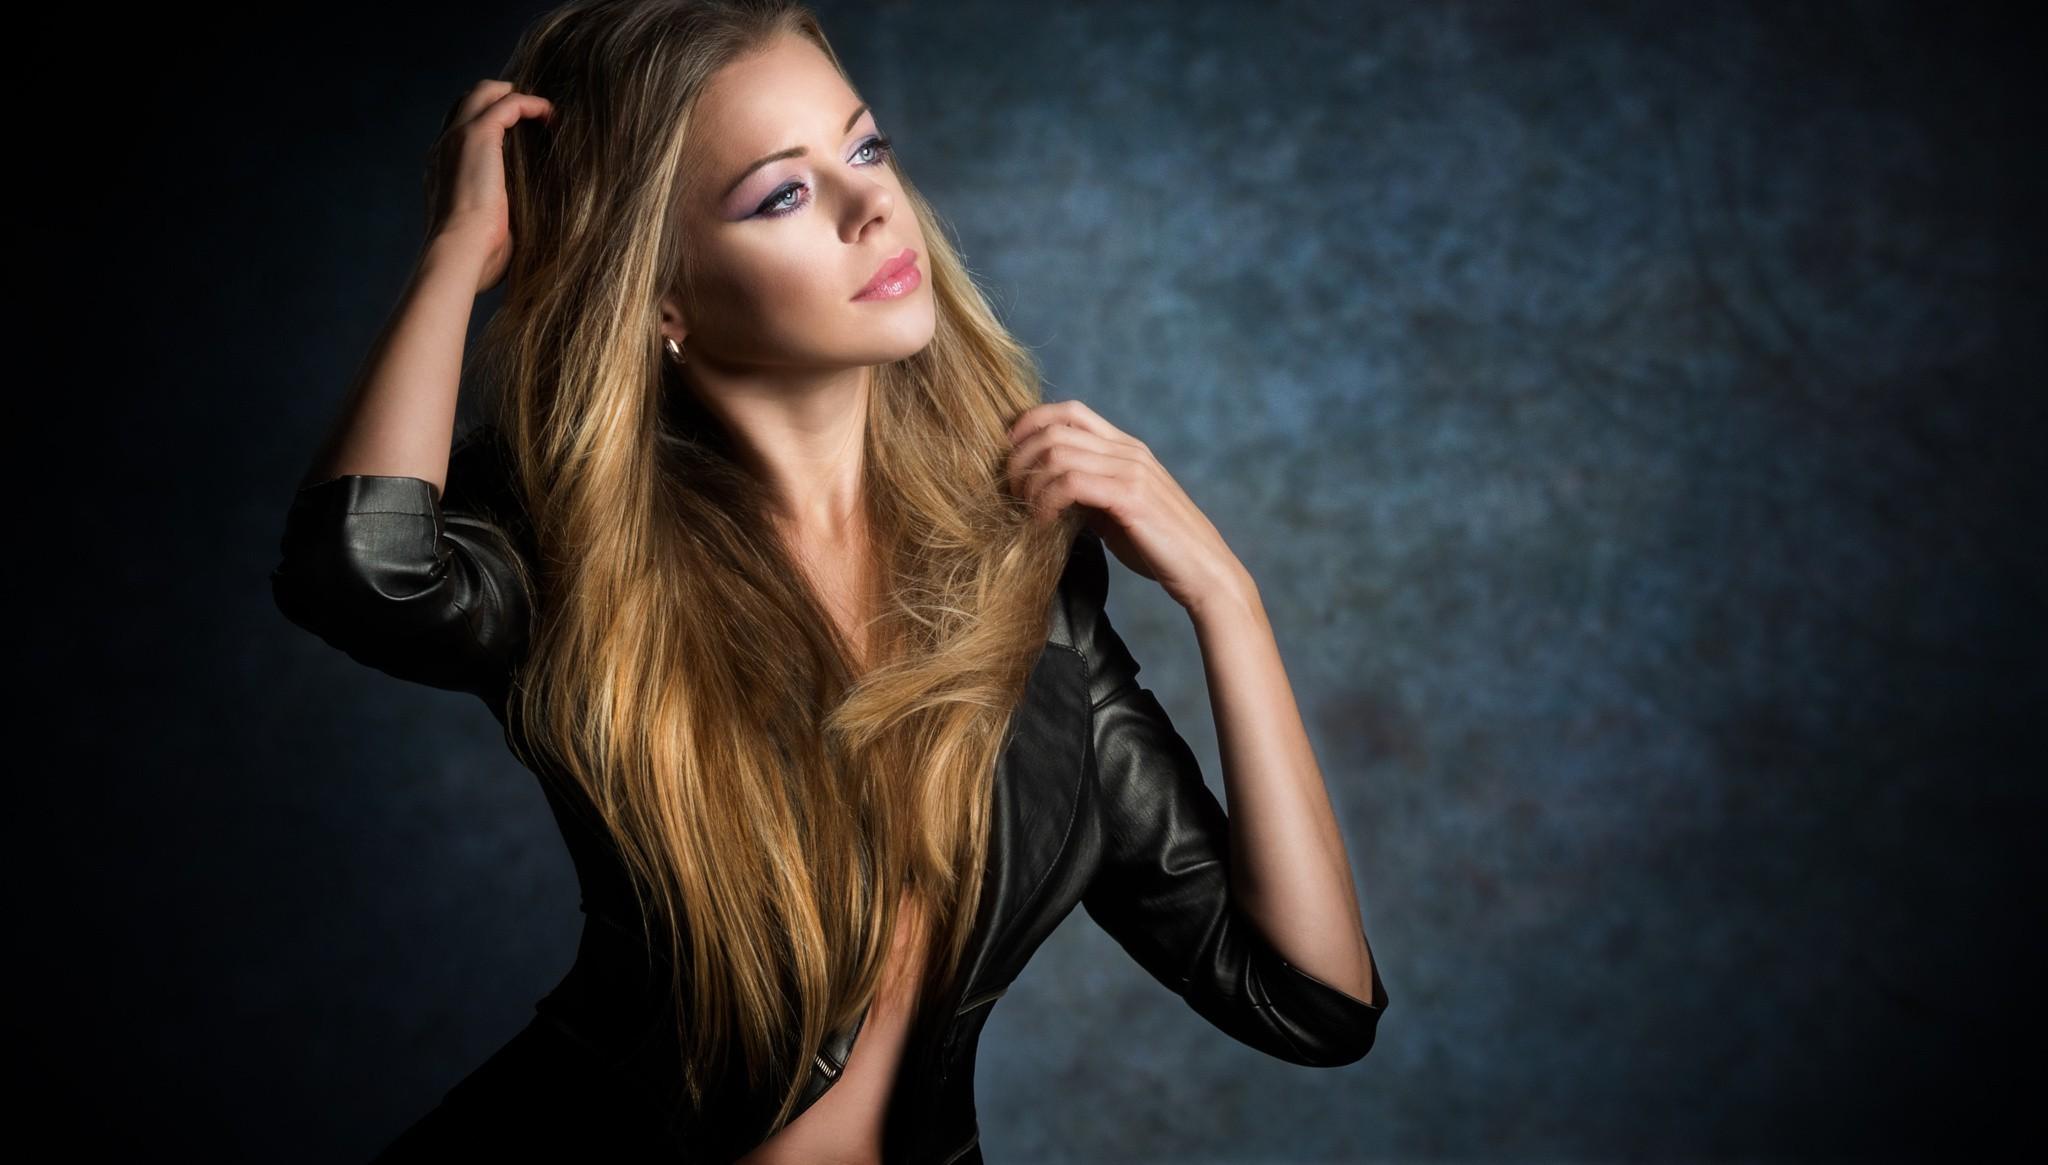 Wallpaper Women Model Long Hair Asian Singer Blue: Wallpaper : Women, Blonde, Looking Away, Long Hair, Blue